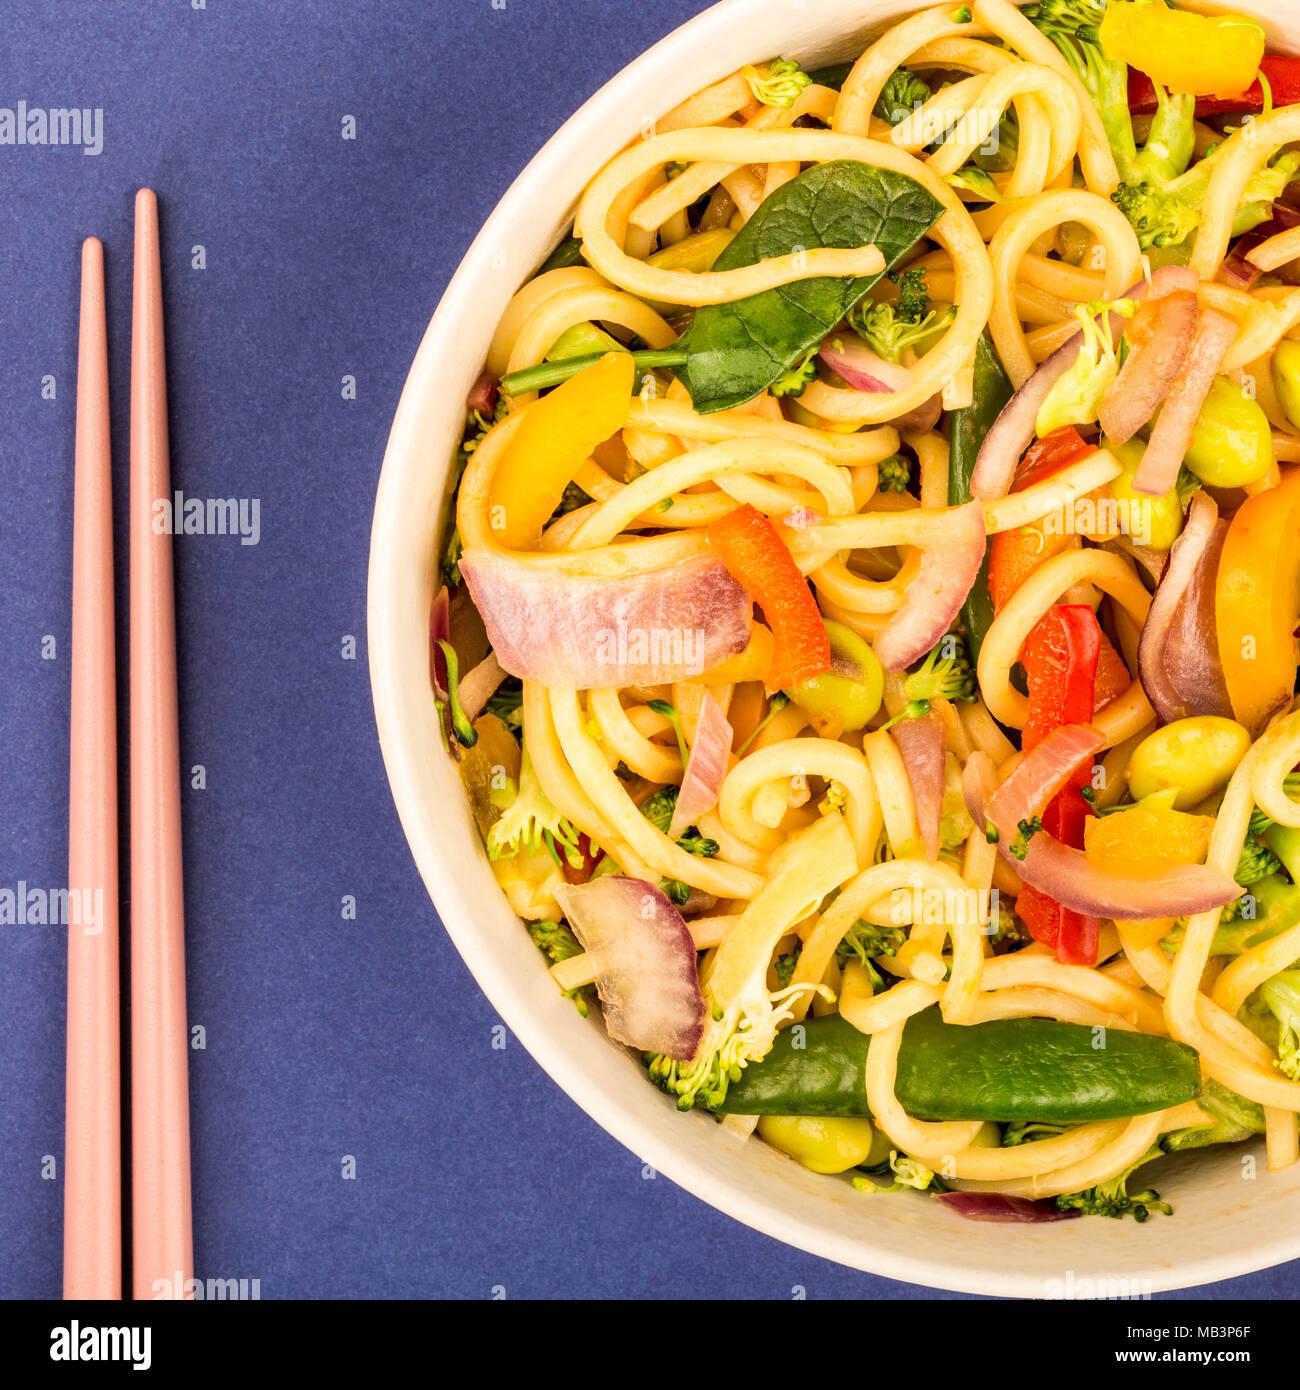 Stir Fried Egg Noodles With Fresh Vegetables Against A Purple Background - Stock Image